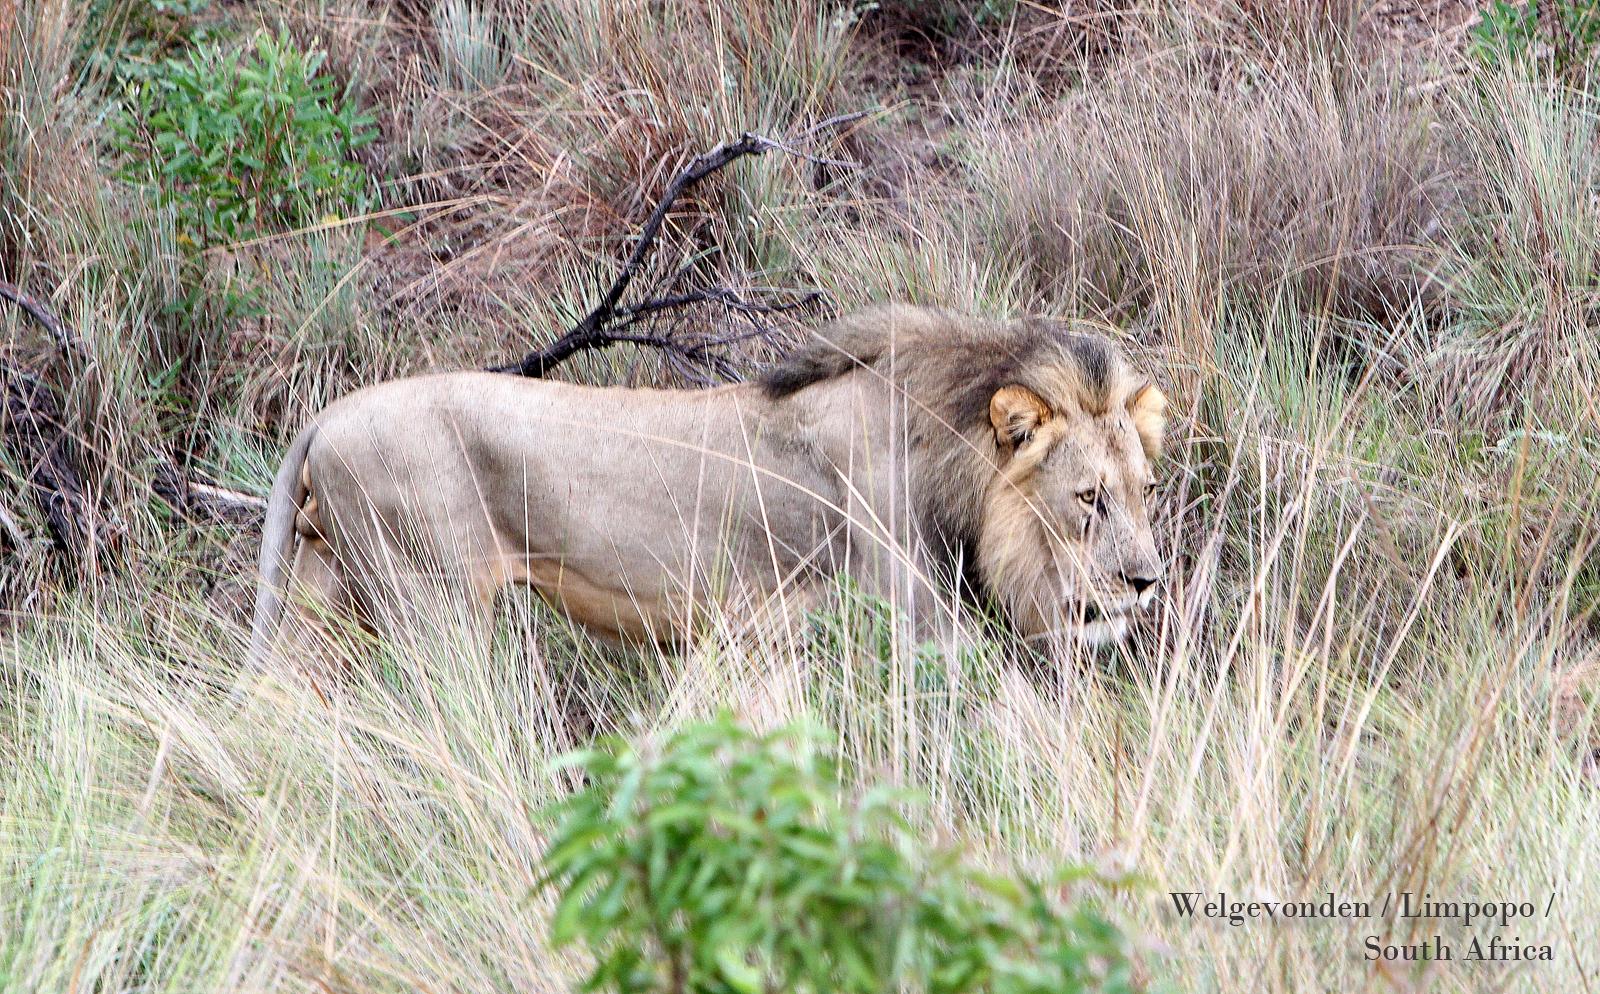 Lion at Welgevonden Limpopo SouthAfrica